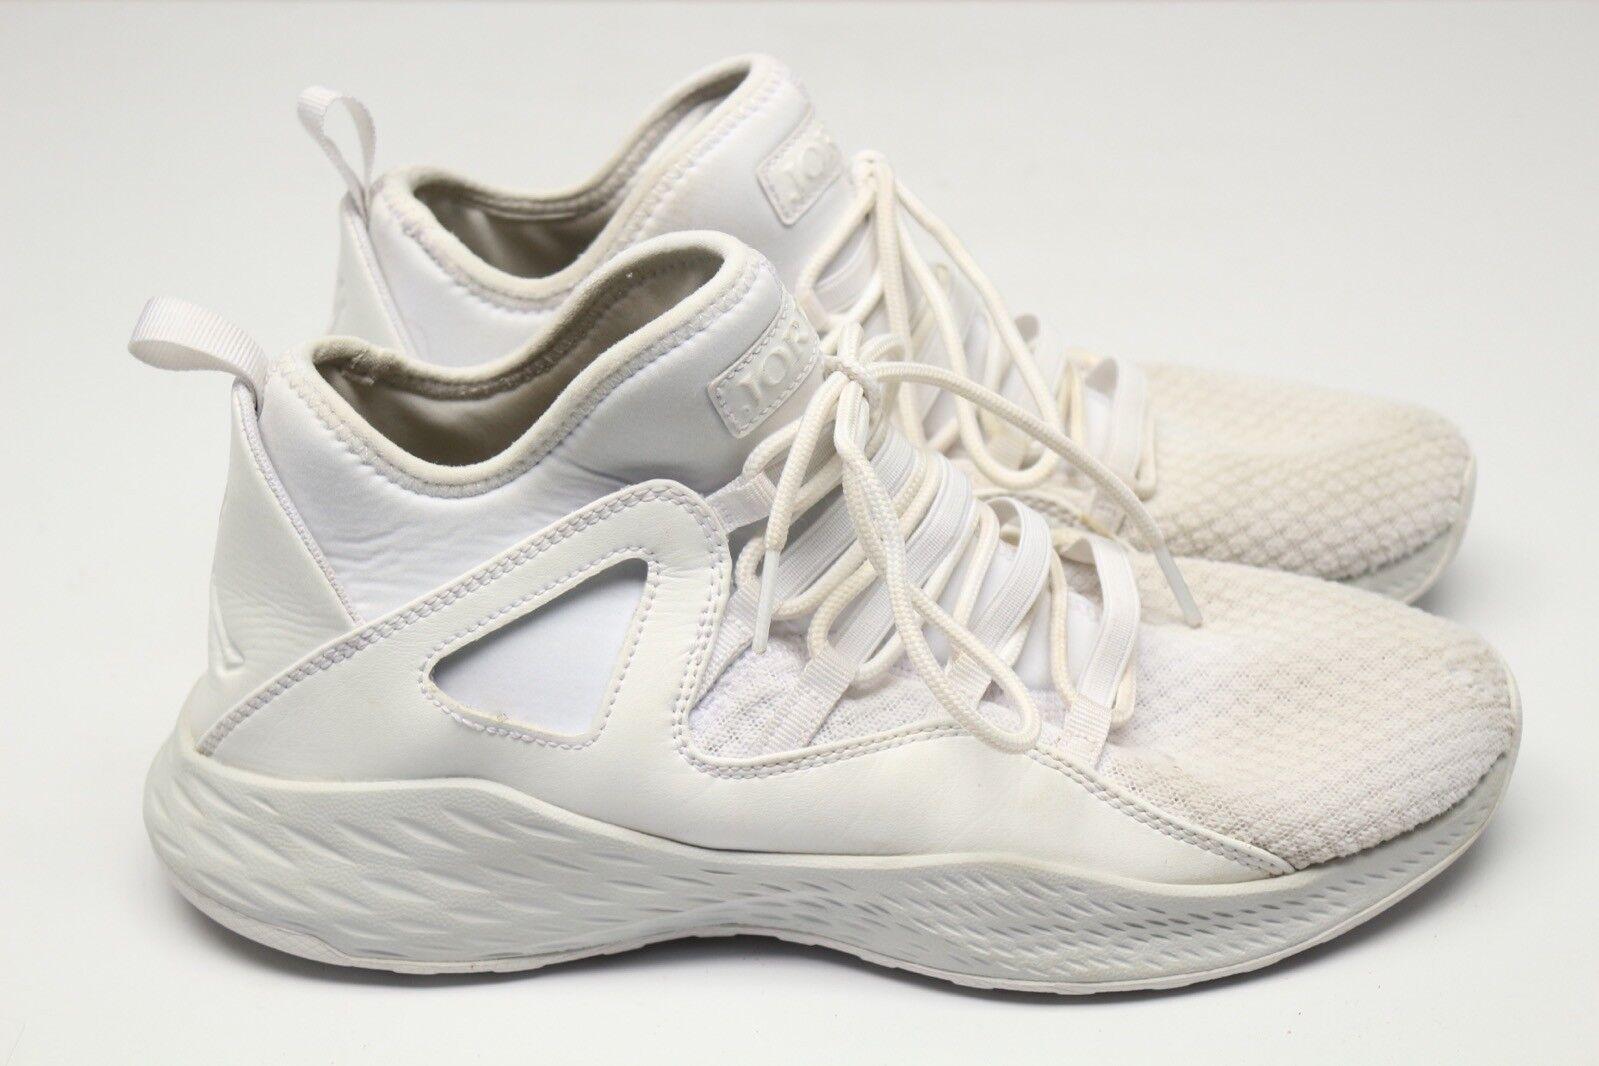 Jordan Formel 23 Dekonstruiert Herren Sneakers 8.5 Weiß/Weiß Dekonstruiert 23 Leder Strick Zeh 7f2dcf